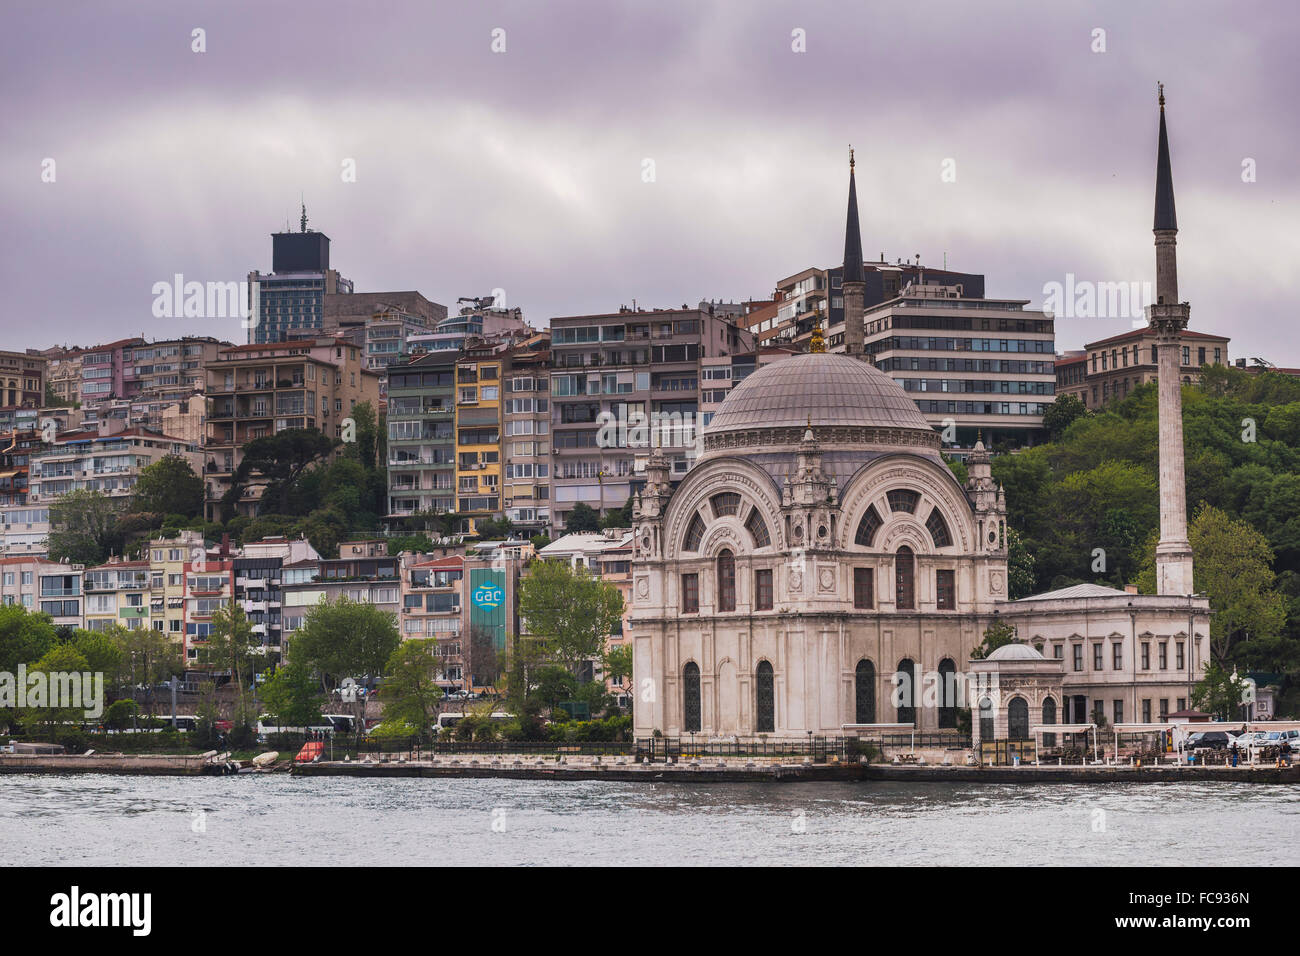 Mezquita a orillas del Bósforo, Estambul, Turquía, Europa Imagen De Stock